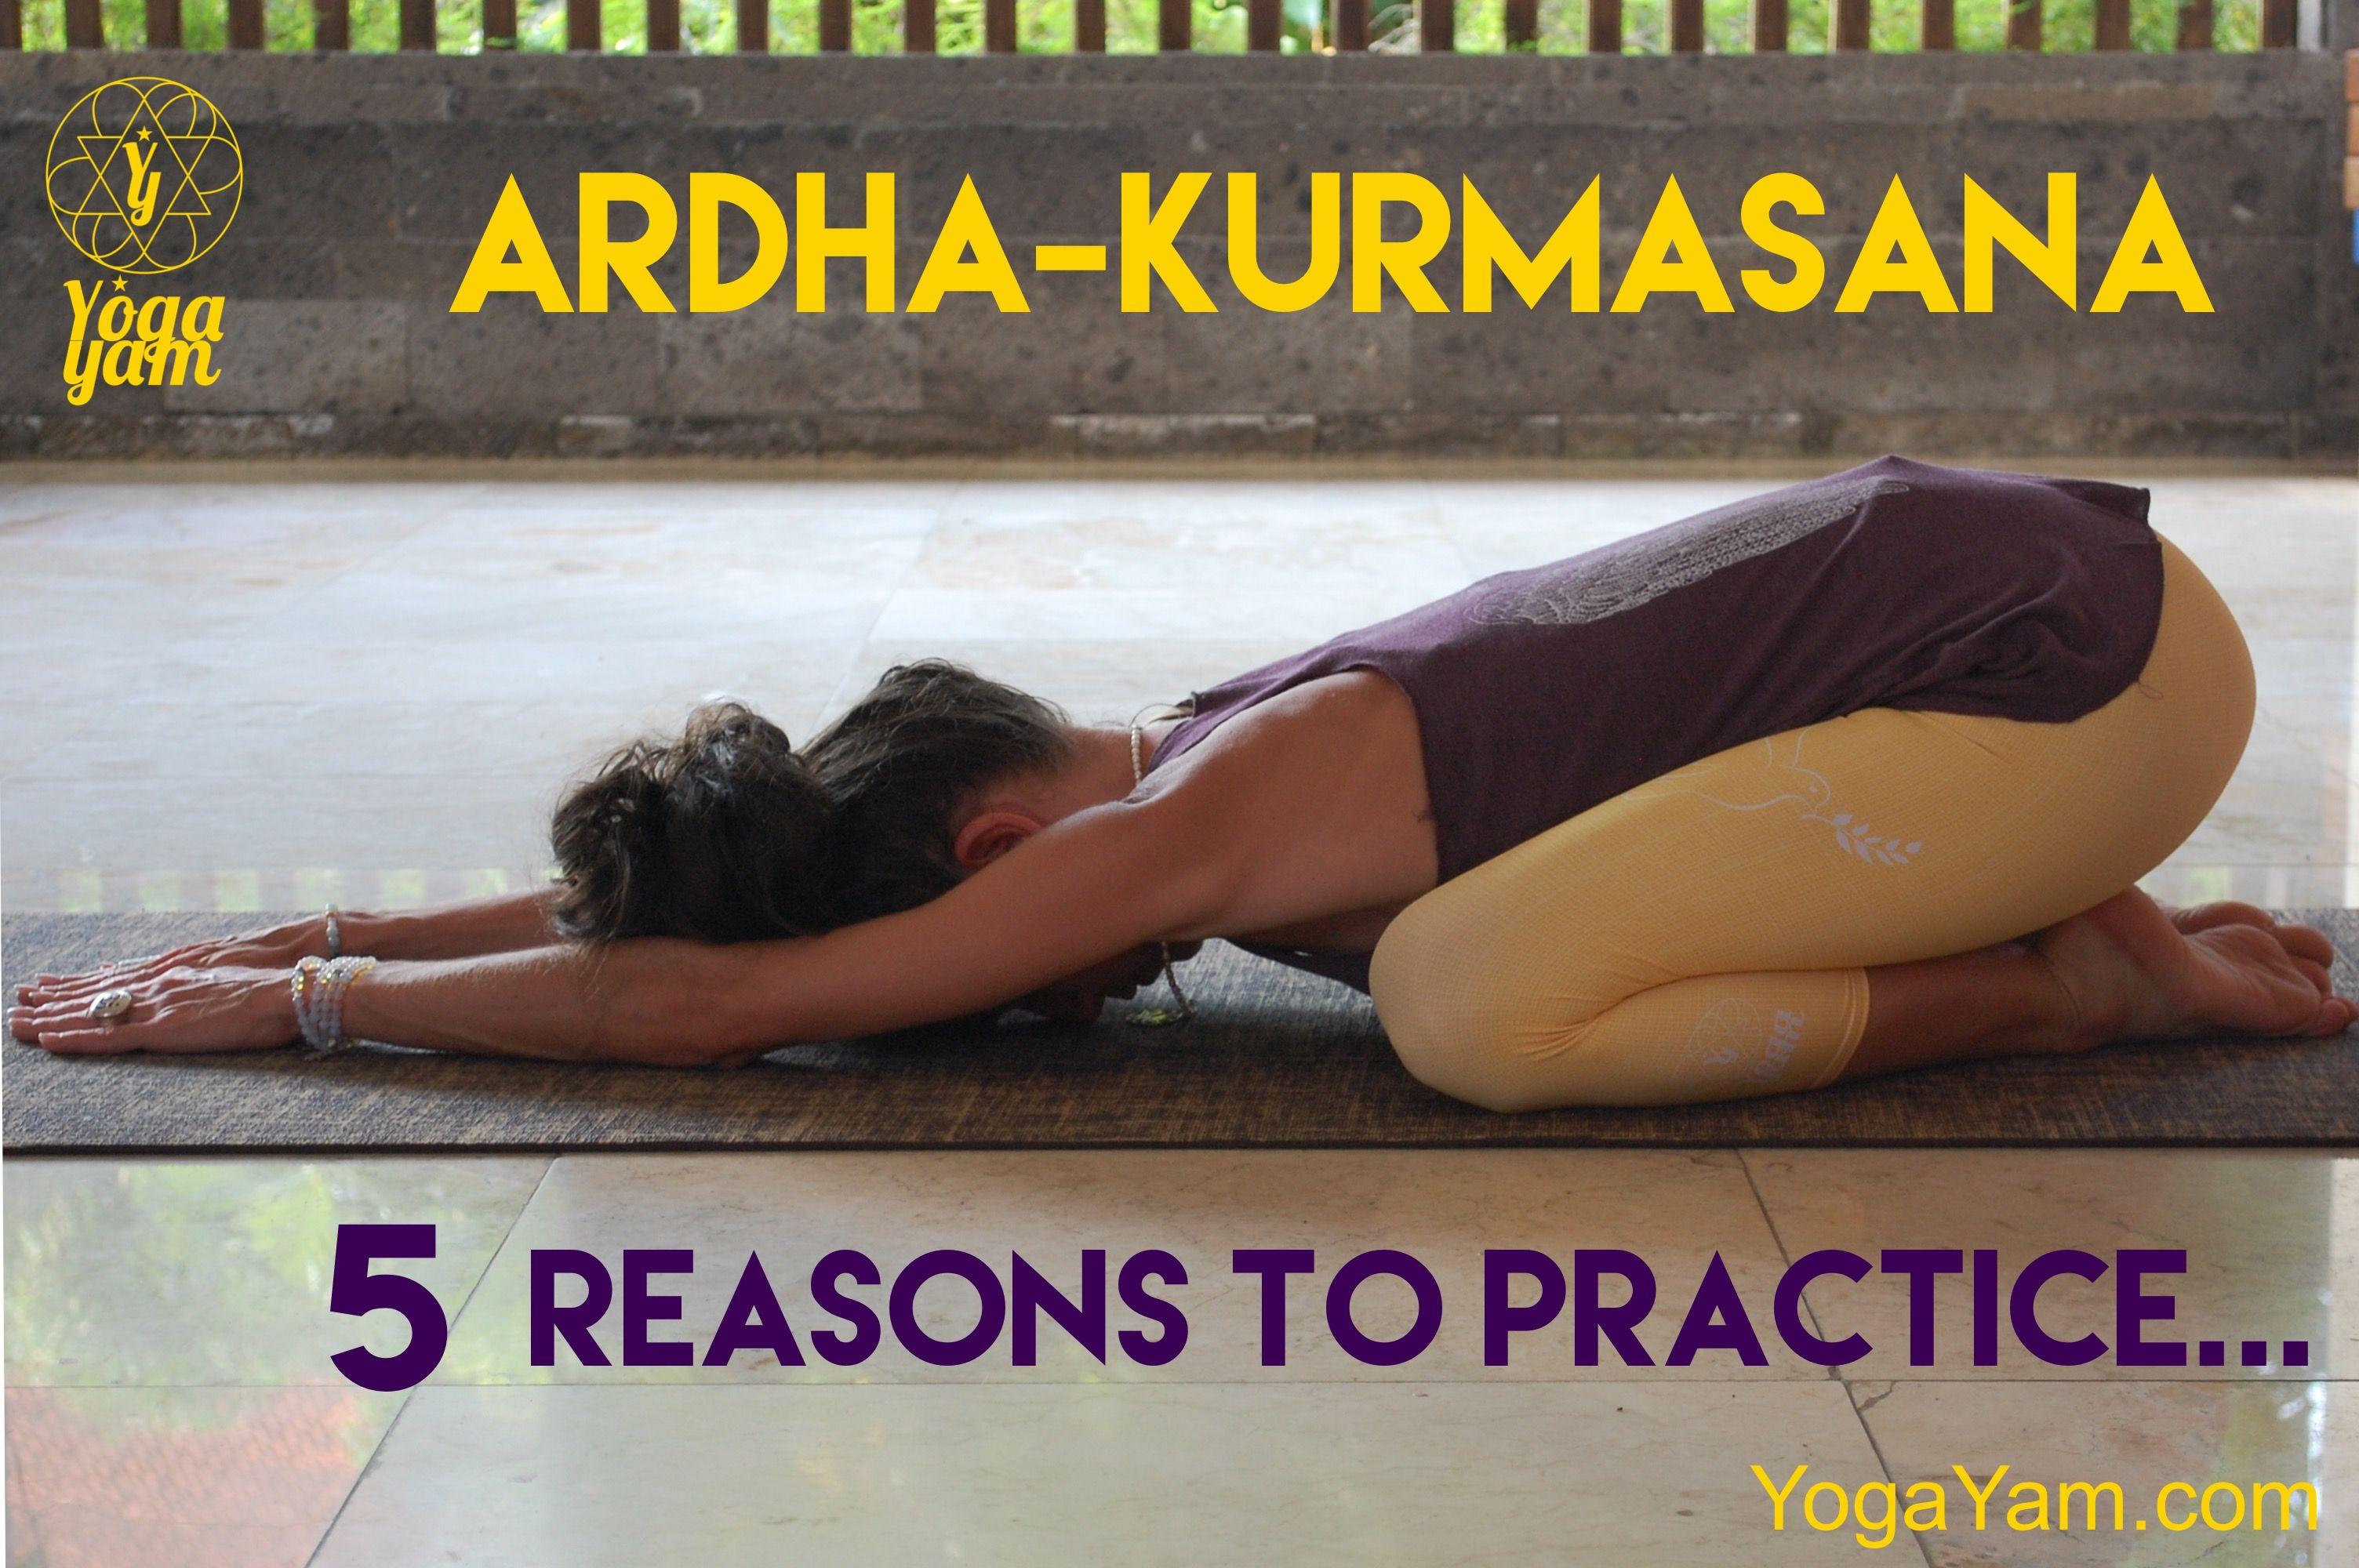 Kurmasana Pose Benefits